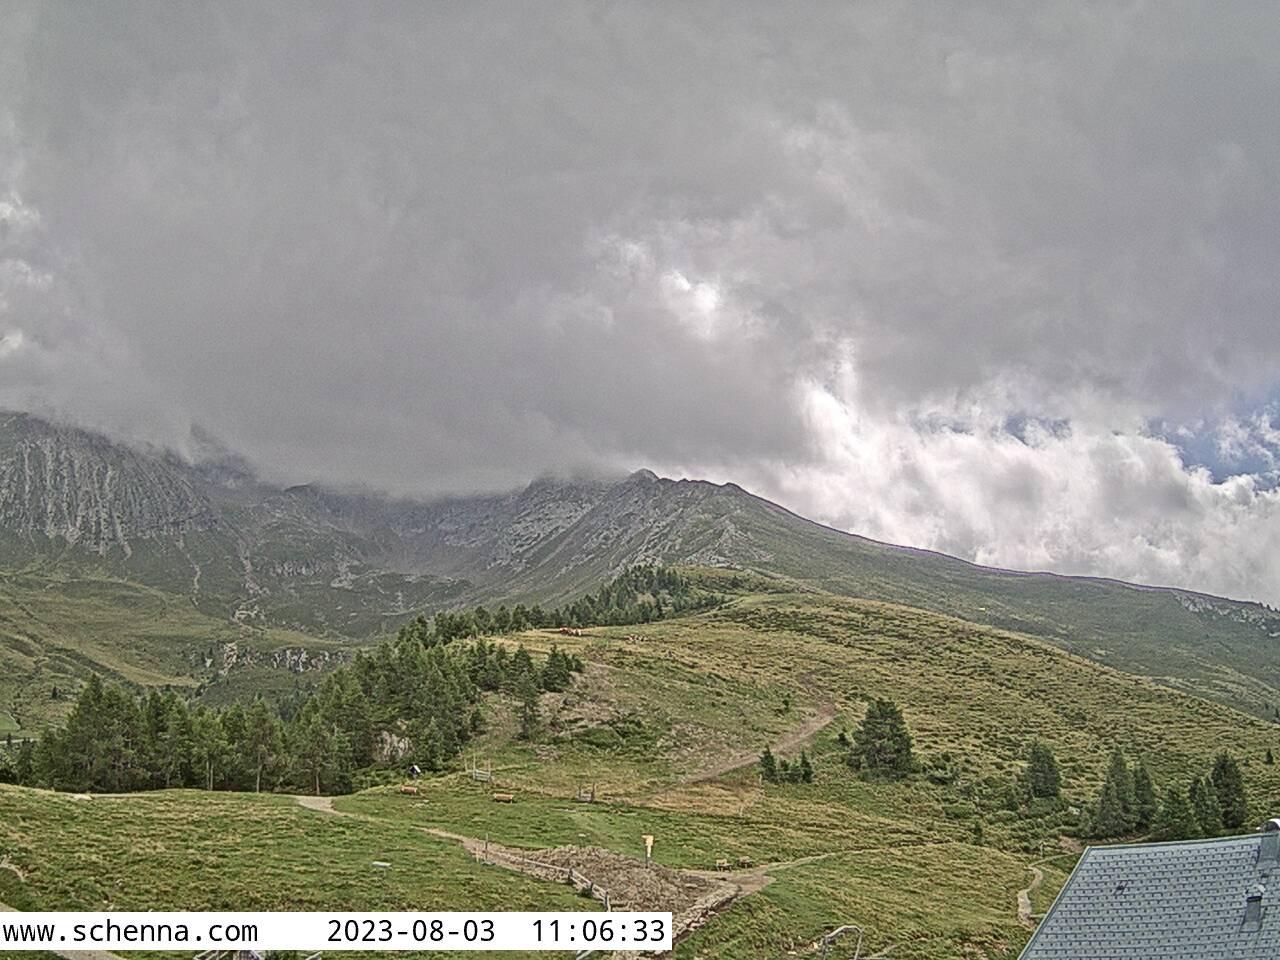 Stazione a Monte Hirzer - Vista zona Hirzer e Monte Hirzer (2.781m)